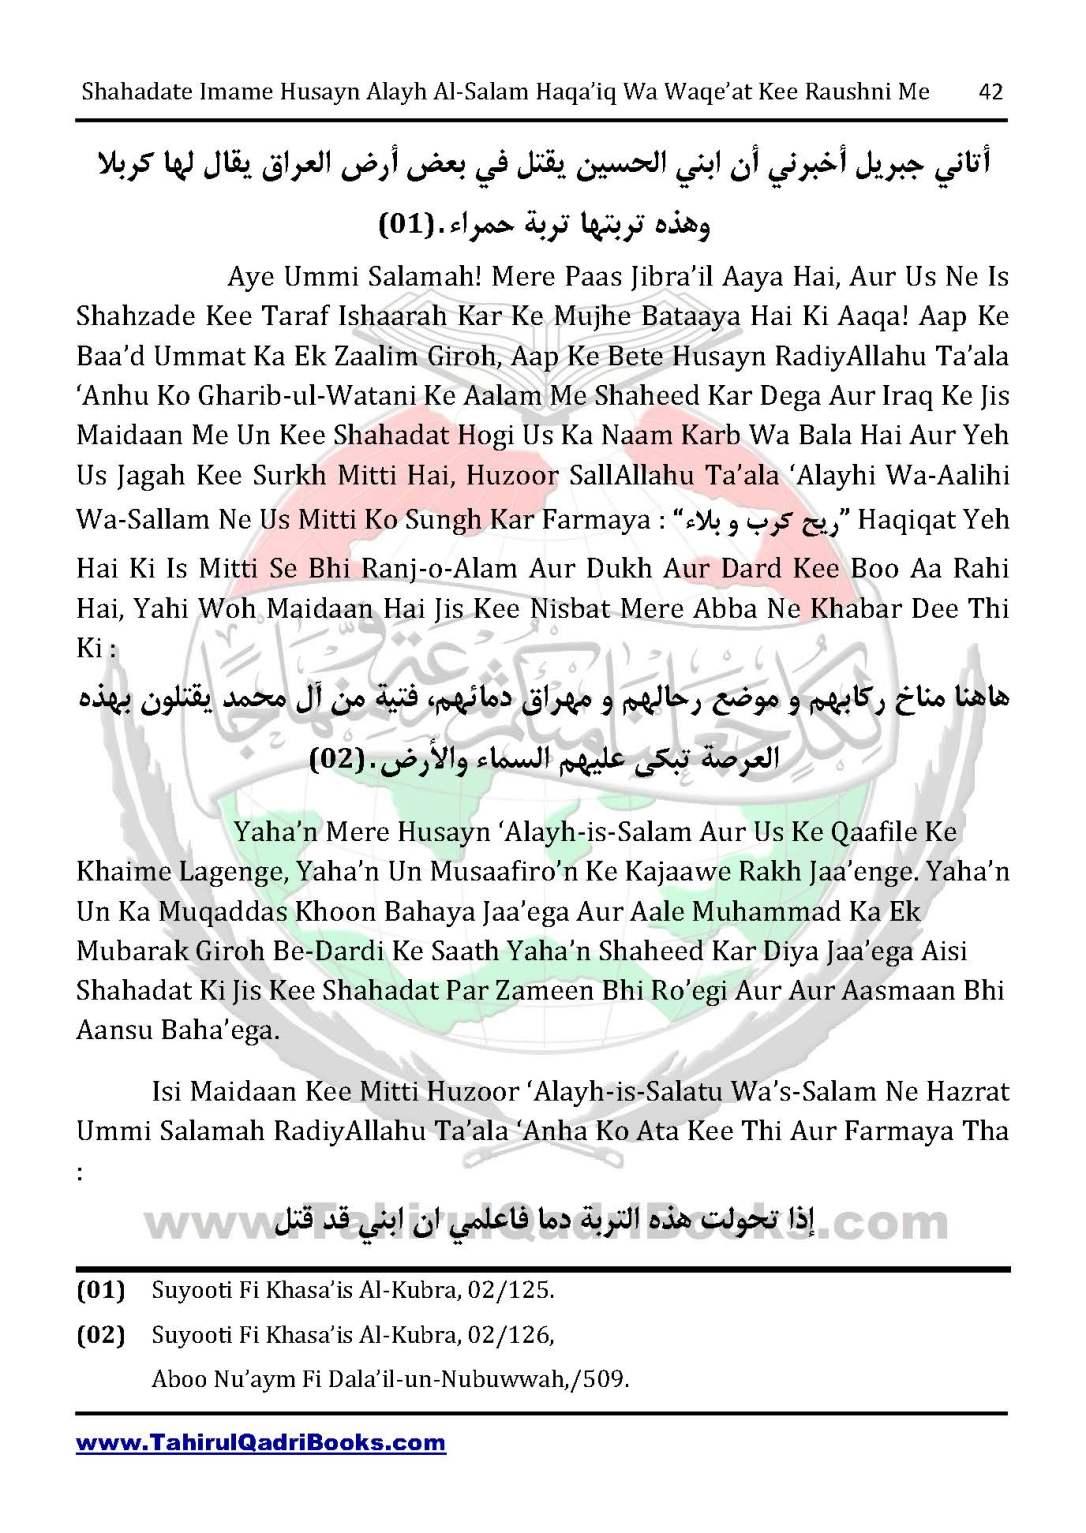 shahadate-imame-husayn-alayh-is-salam-haqaiq-wa-waqe_at-kee-raushni-me-in-roman-urdu-unlocked_Page_42